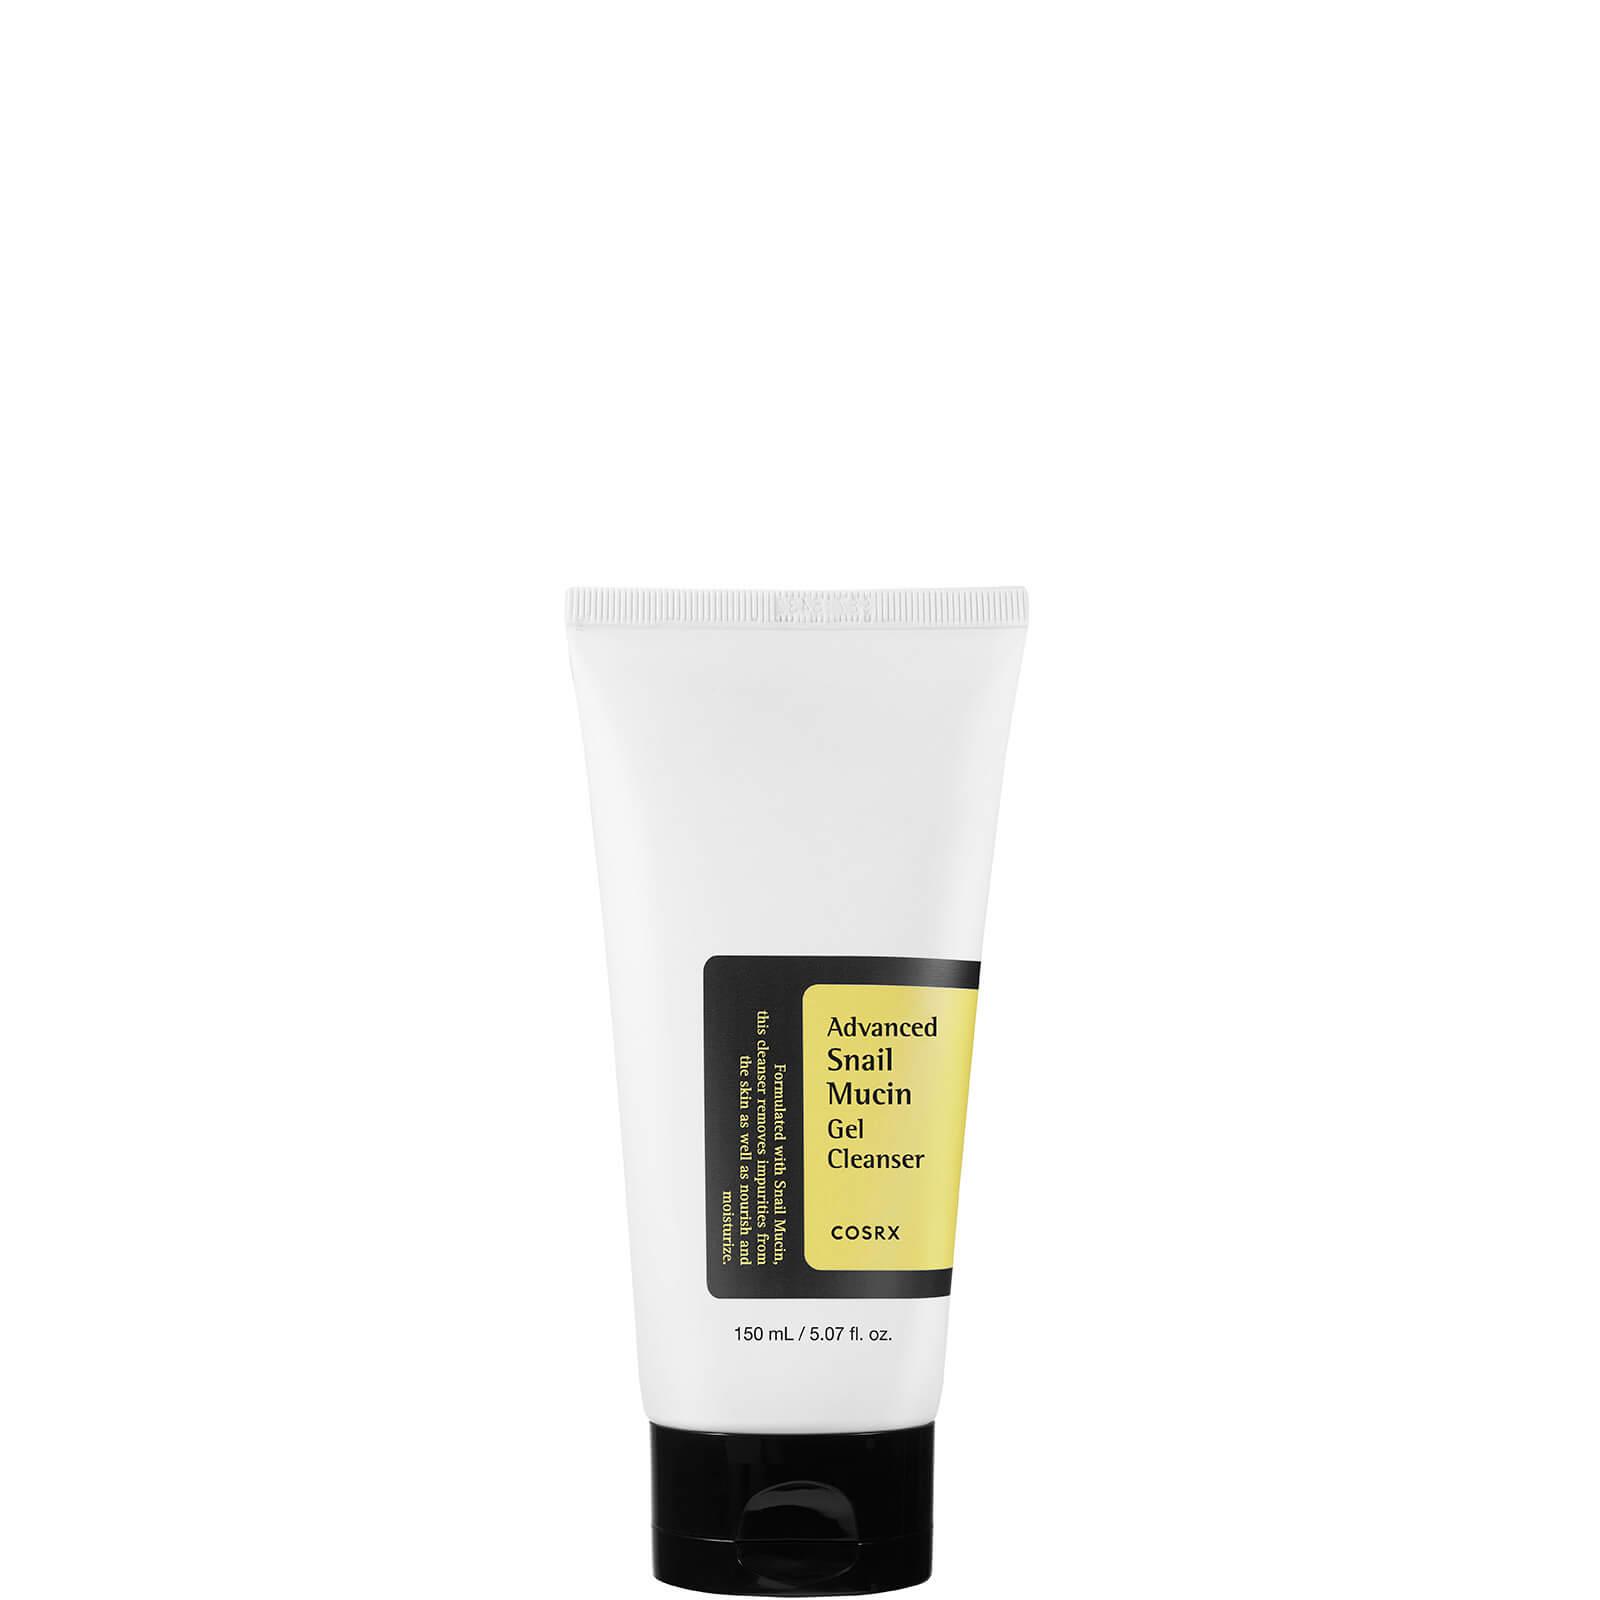 Купить COSRX Advanced Snail Mucin Gel Cleanser 150ml